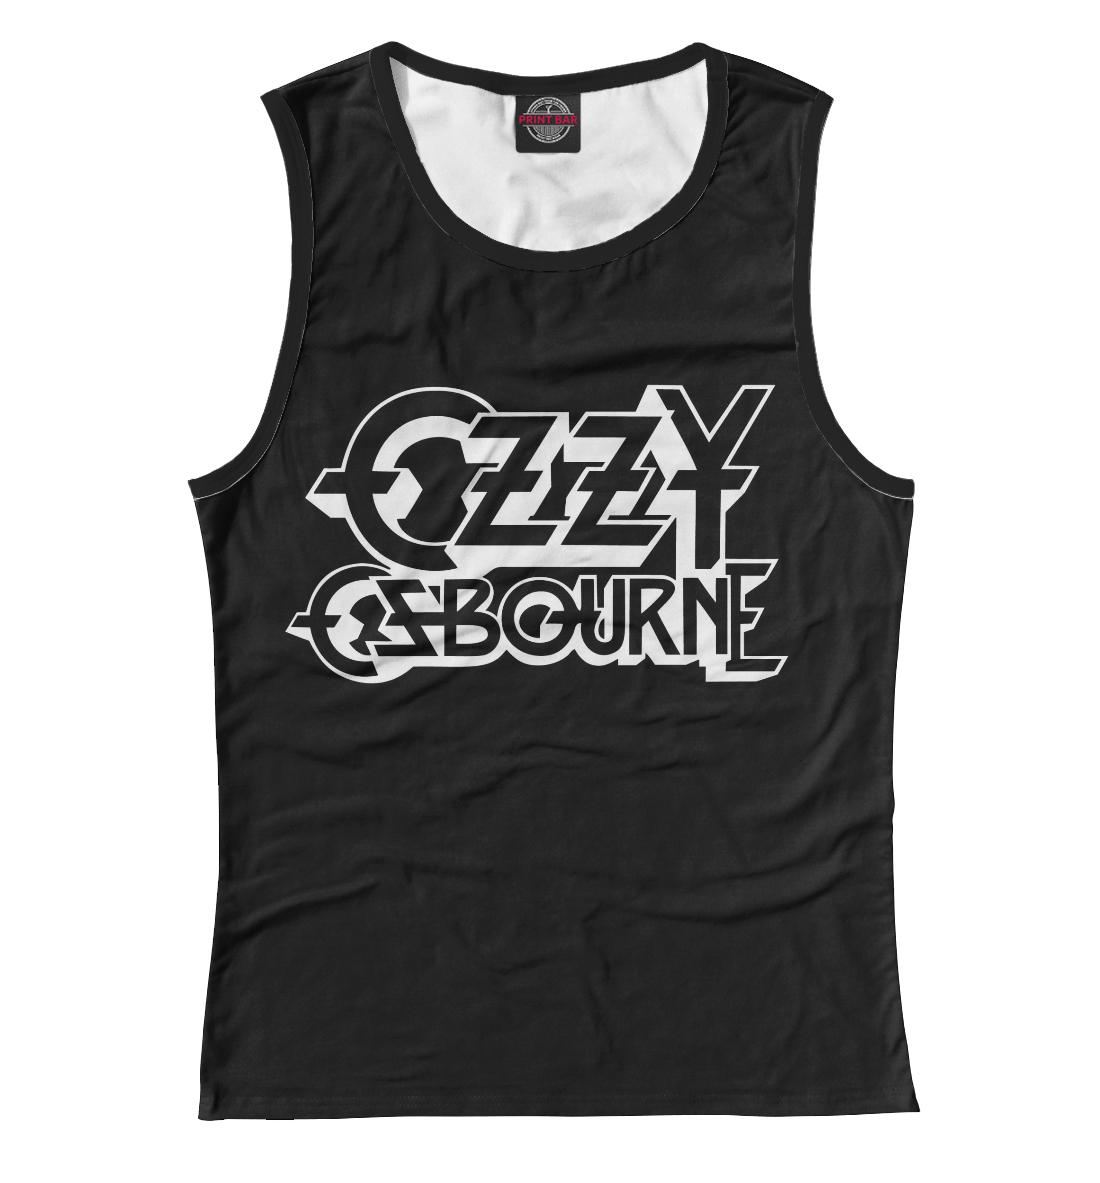 Купить Ozzy Osbourne, Printbar, Майки, MZK-905511-may-1